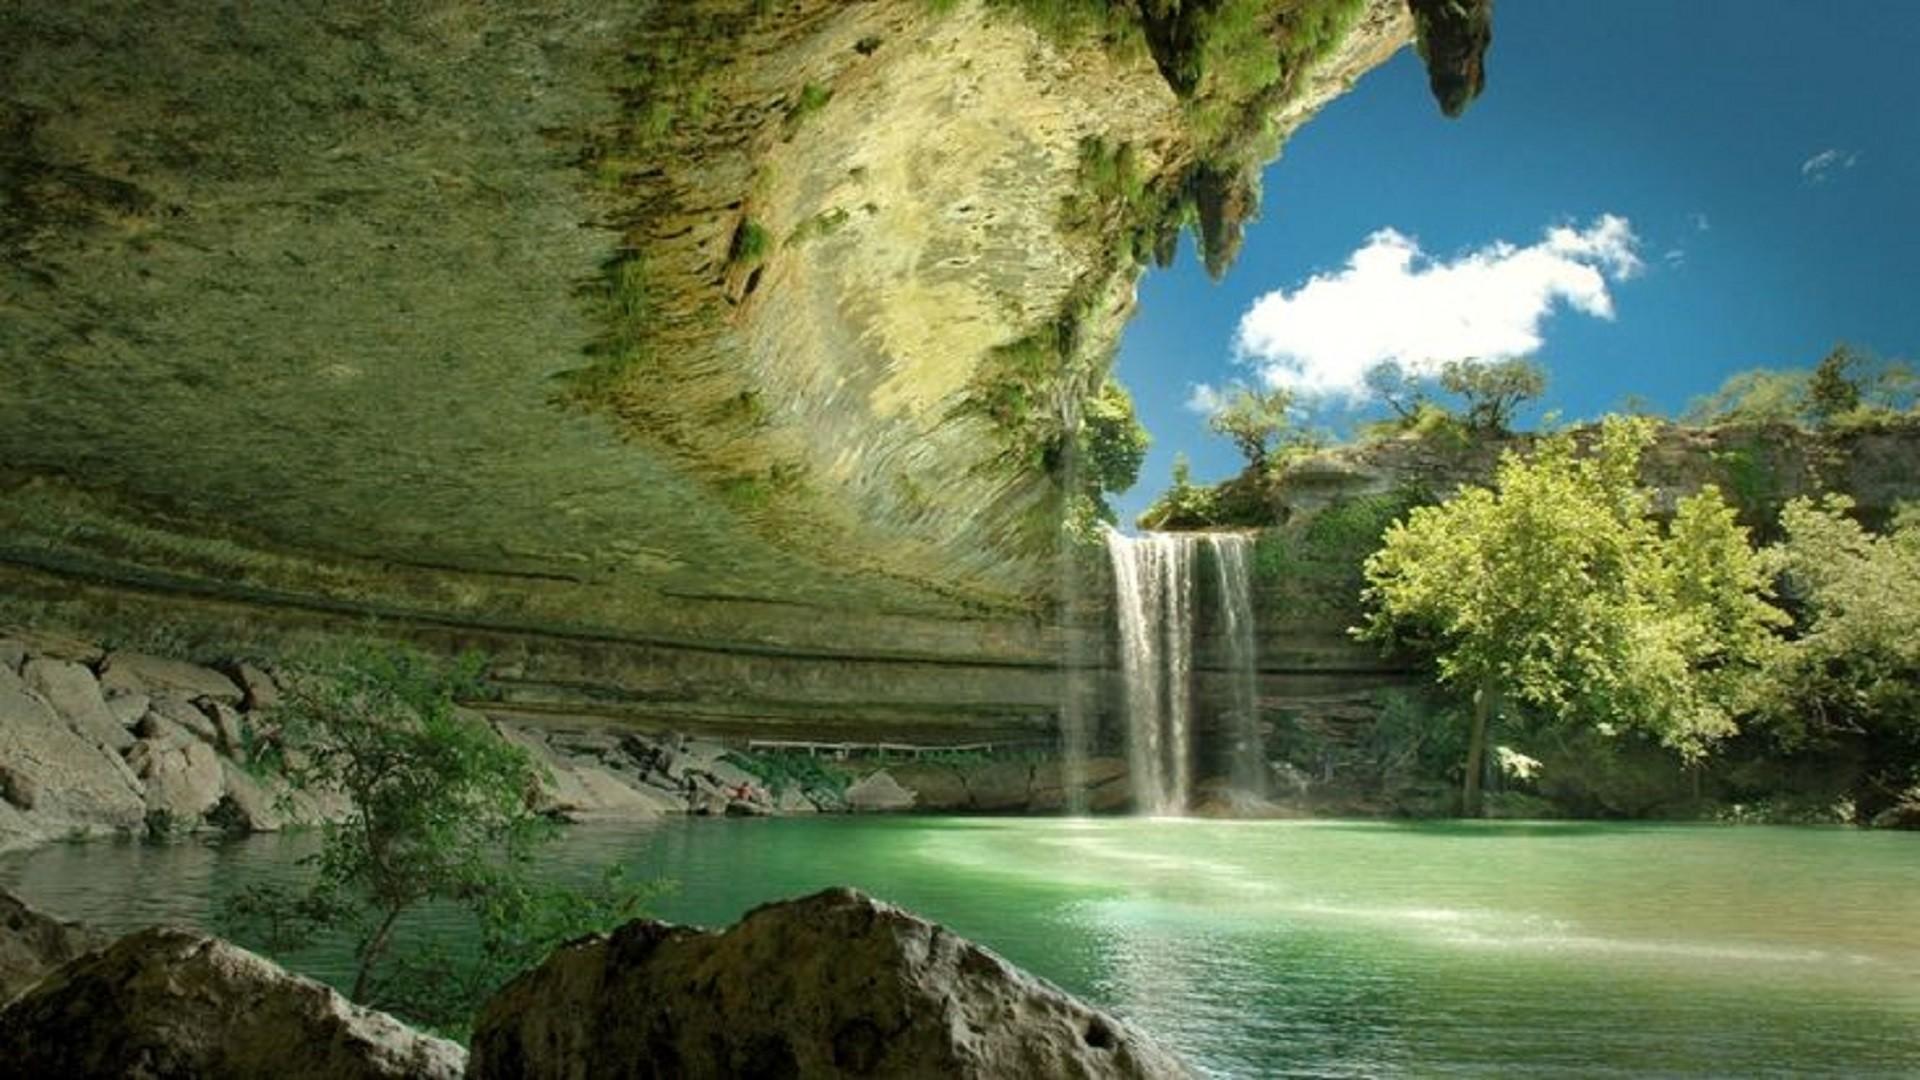 Res: 1920x1080, best waterfall wallpaper waterfall and rainbow wallpaper full hd for desktop  wallpaper - Wallpaper Bits